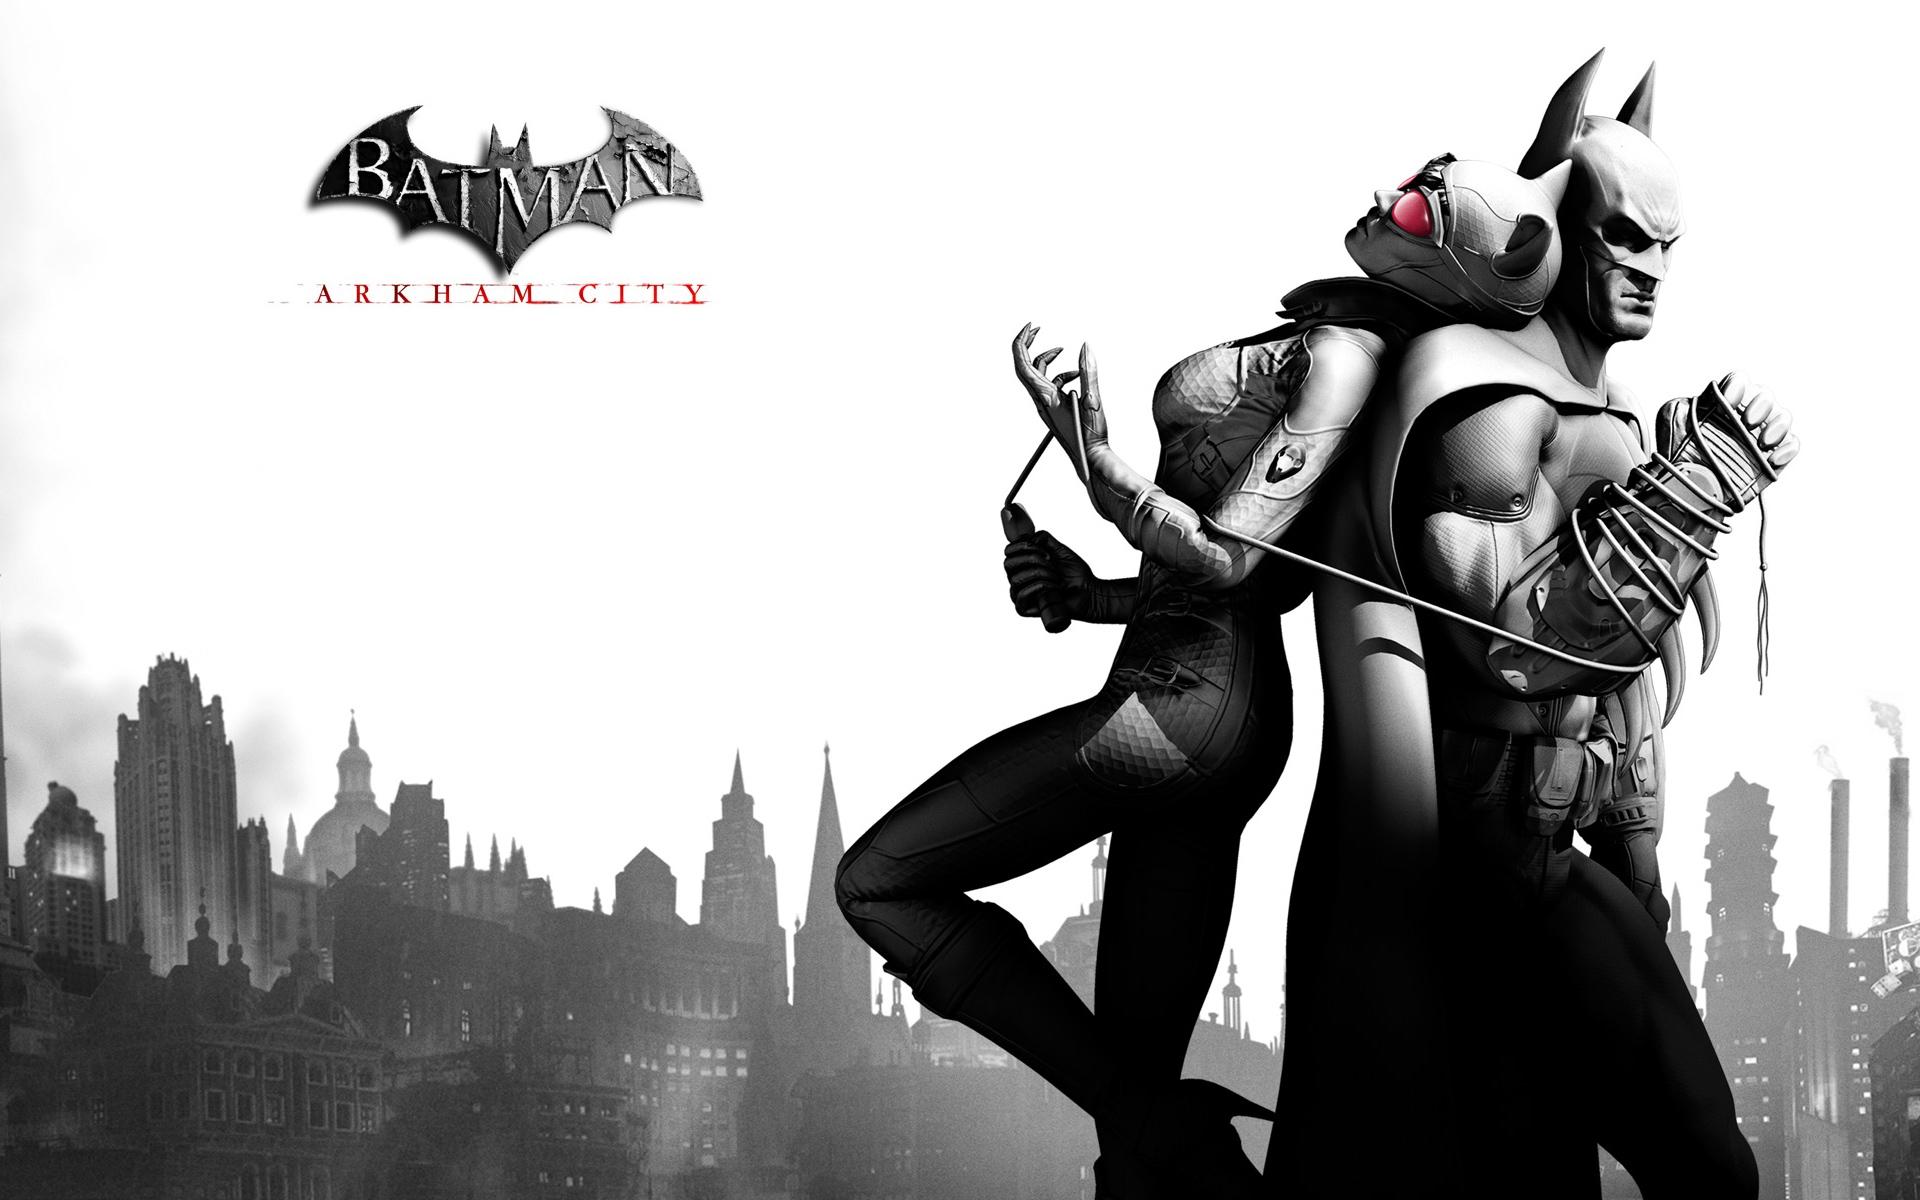 Batman arkham city cover catwoman & batman